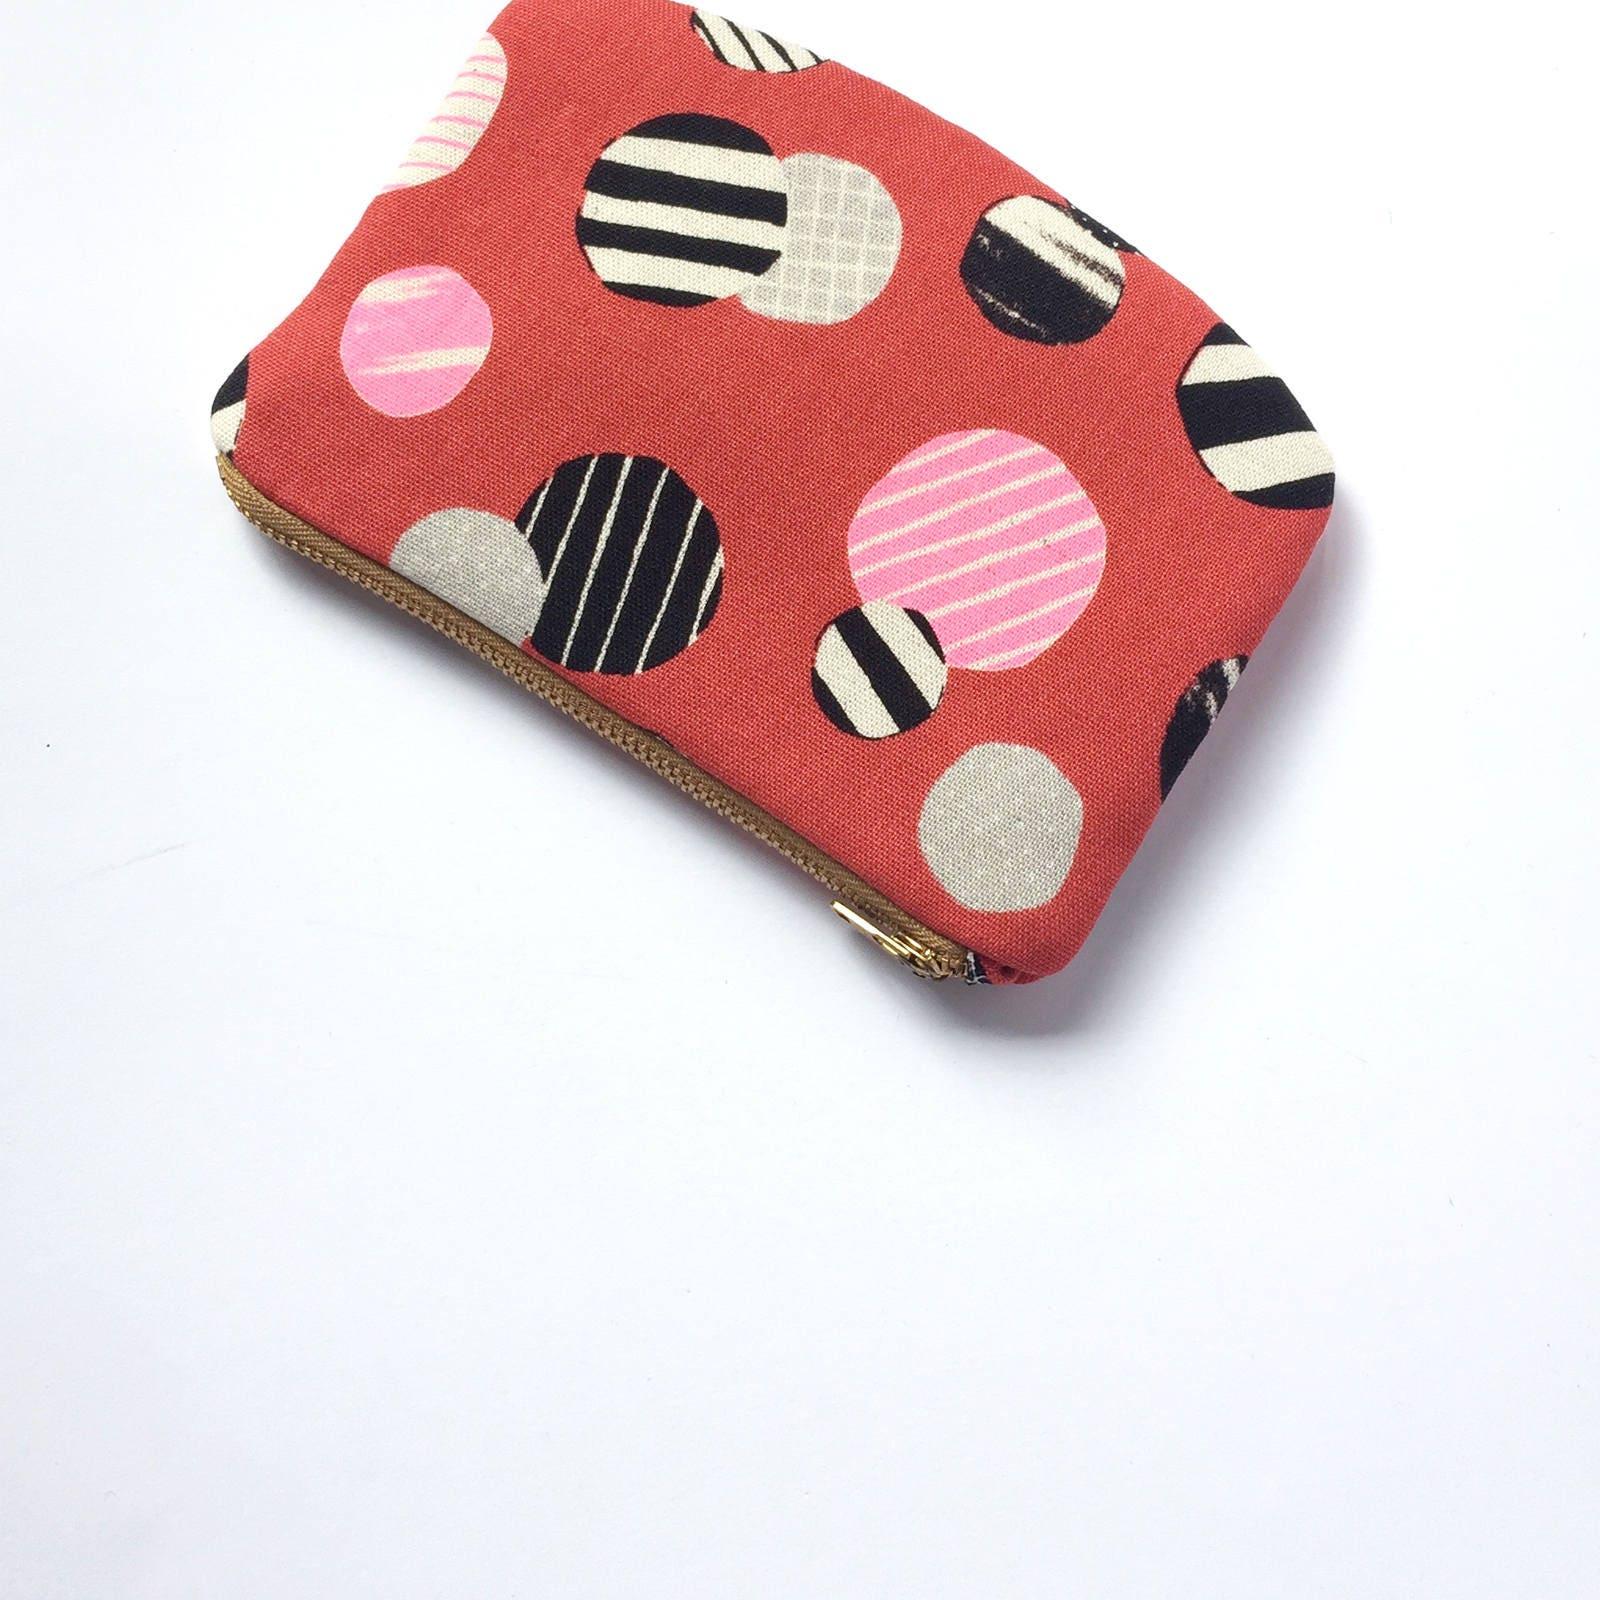 circles canvas zipper pouch travel purse wallet coin purse